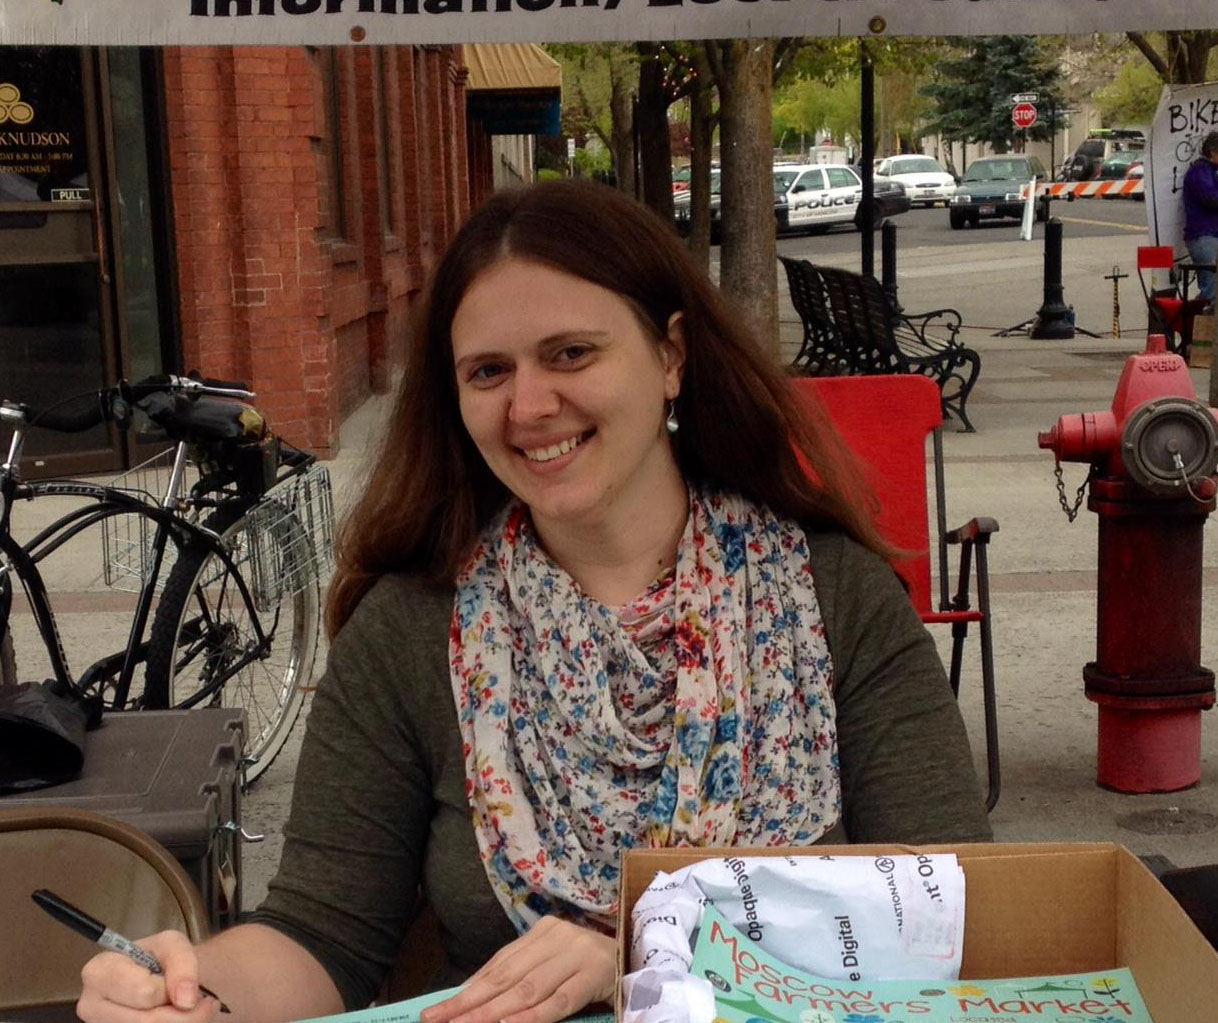 Carrie Kyser, Instructional Designer